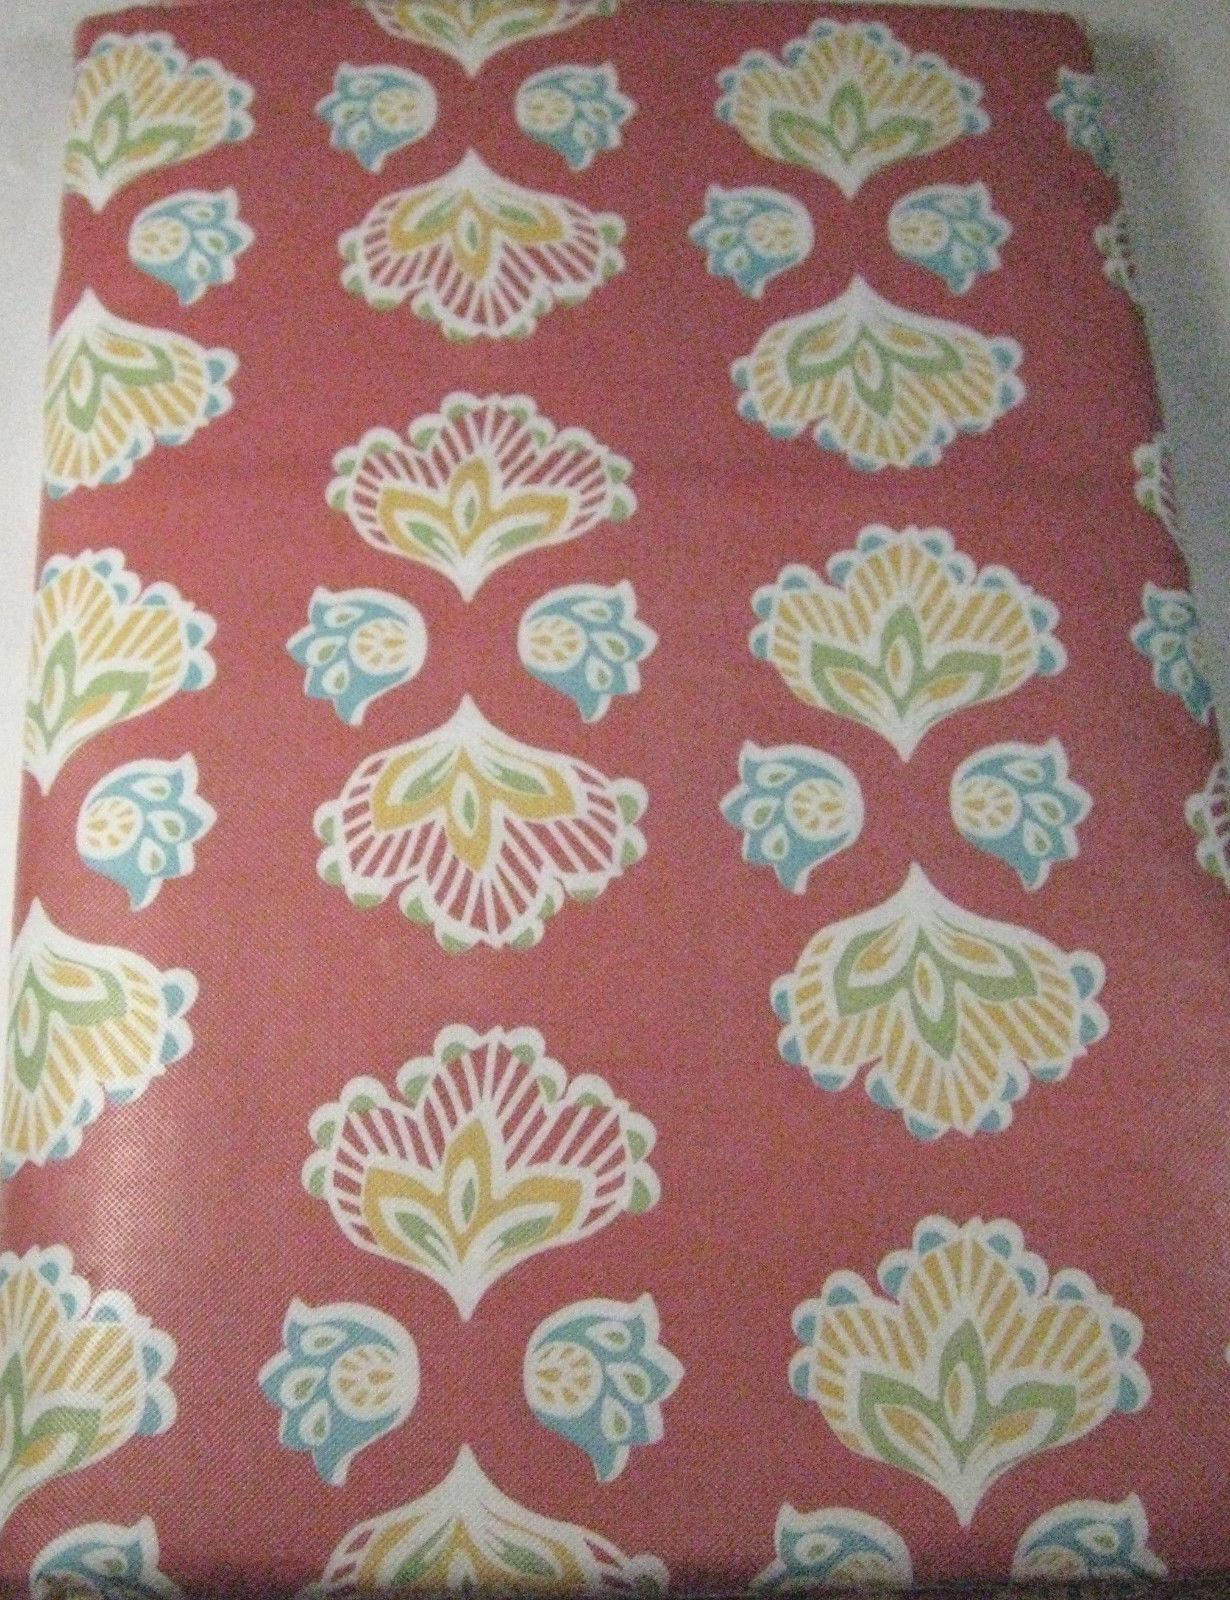 70 Inch Square Tablecloth   60 Vinyl Round Tablecloth   Vinyl Tablecloths